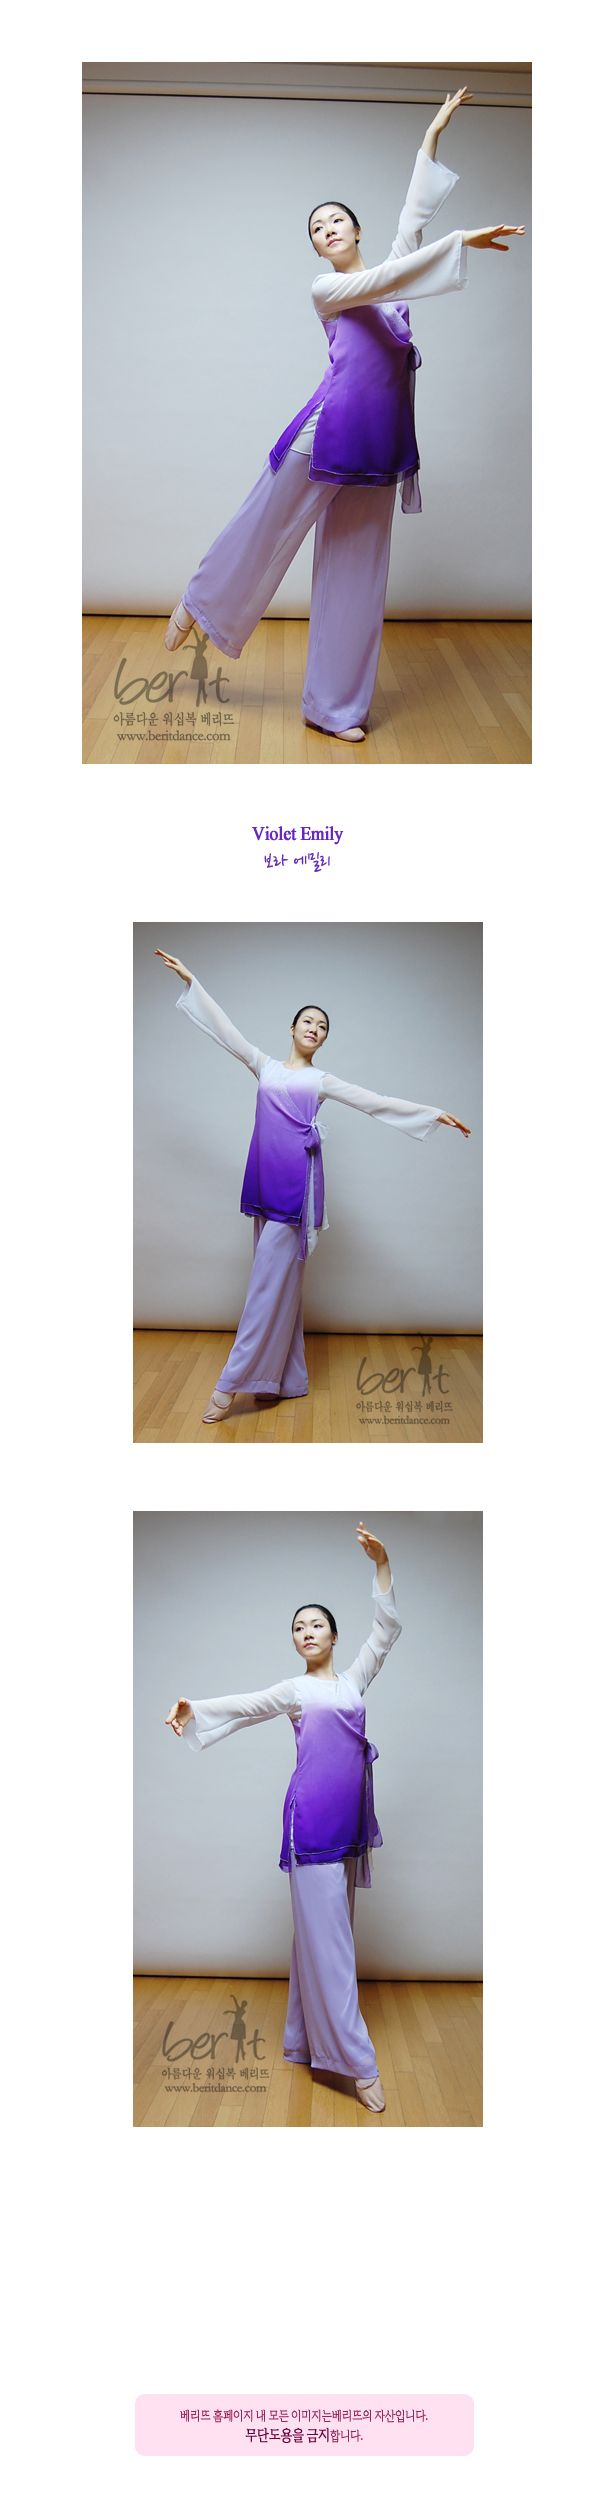 282 best images about Ministerio de Danza, pandero, on ...